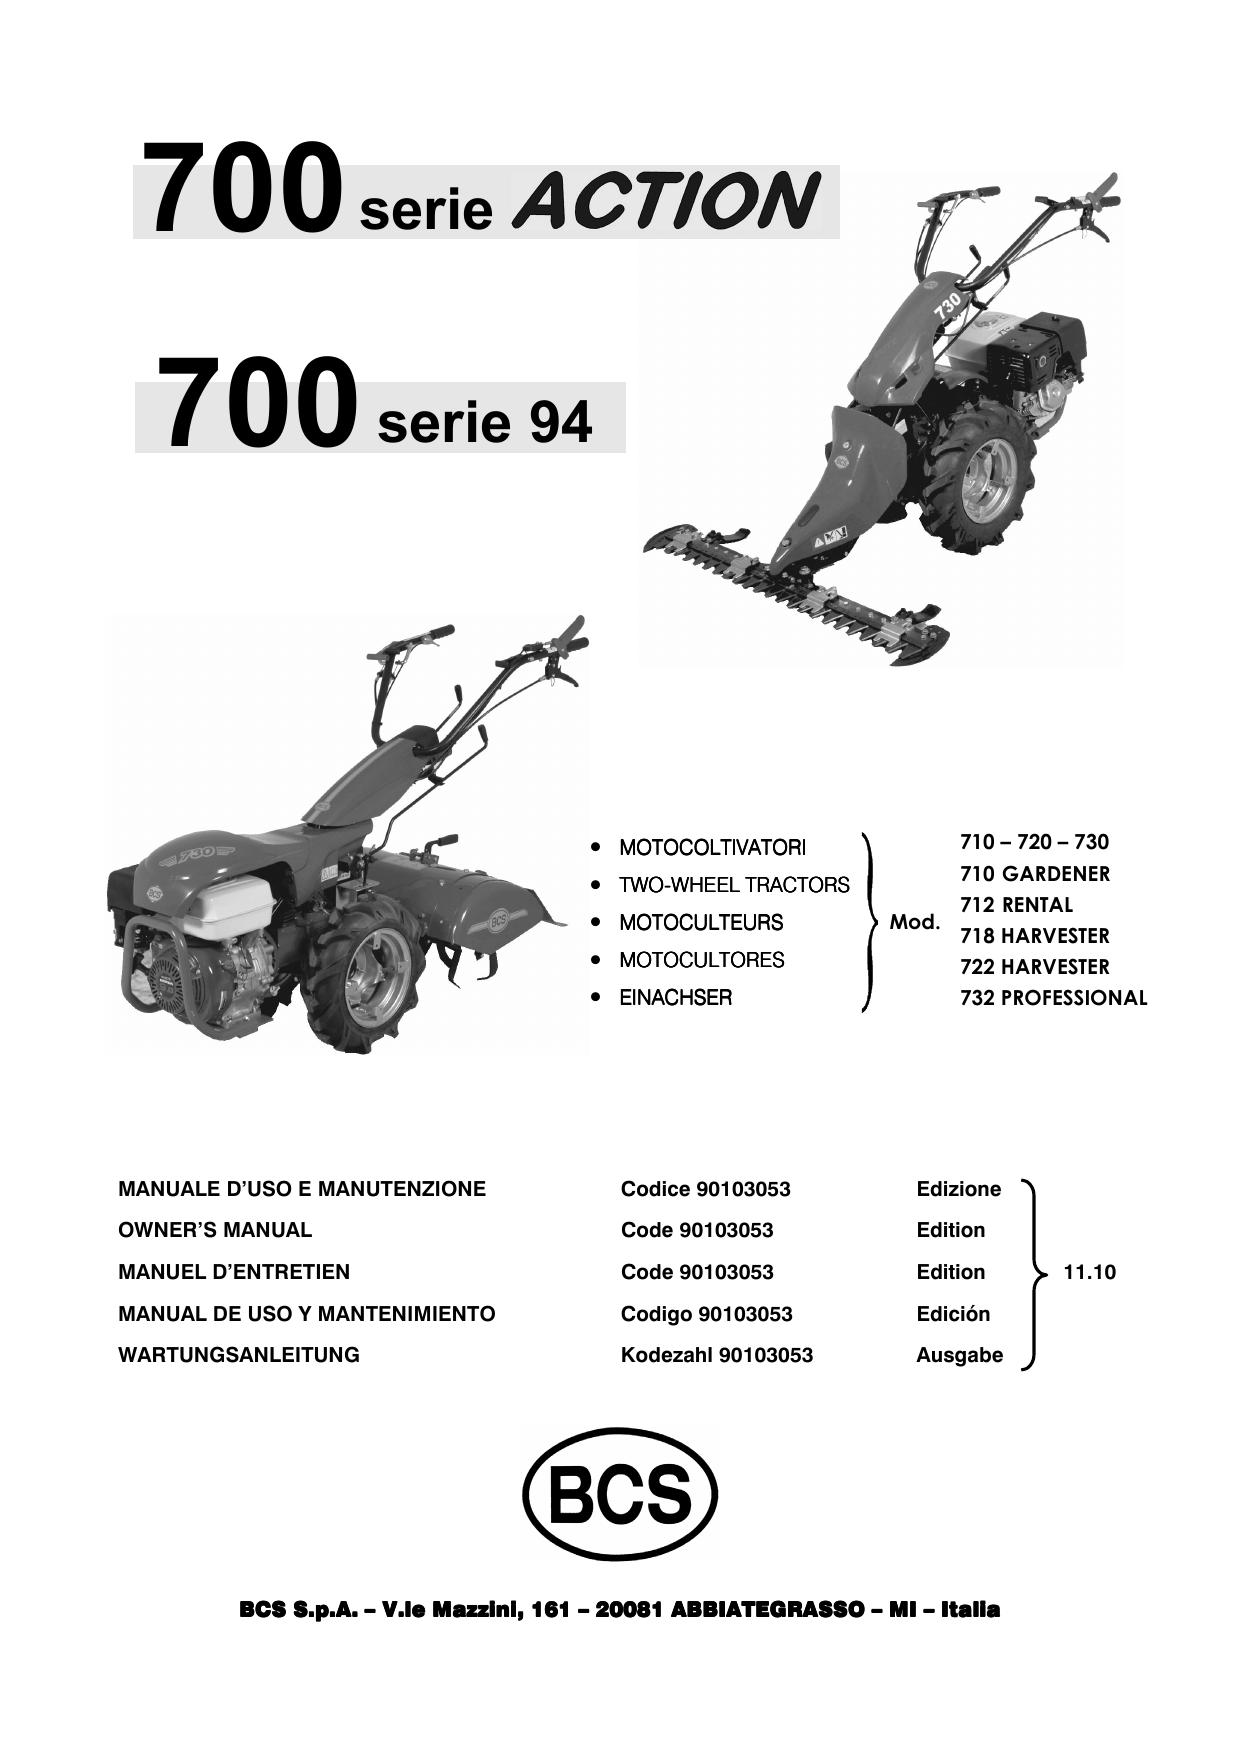 Recoil STARTER TIRETTE Corde ø Diamètre 5.0 mm tondeuse motoculteur etc 5.0 Tondeuse